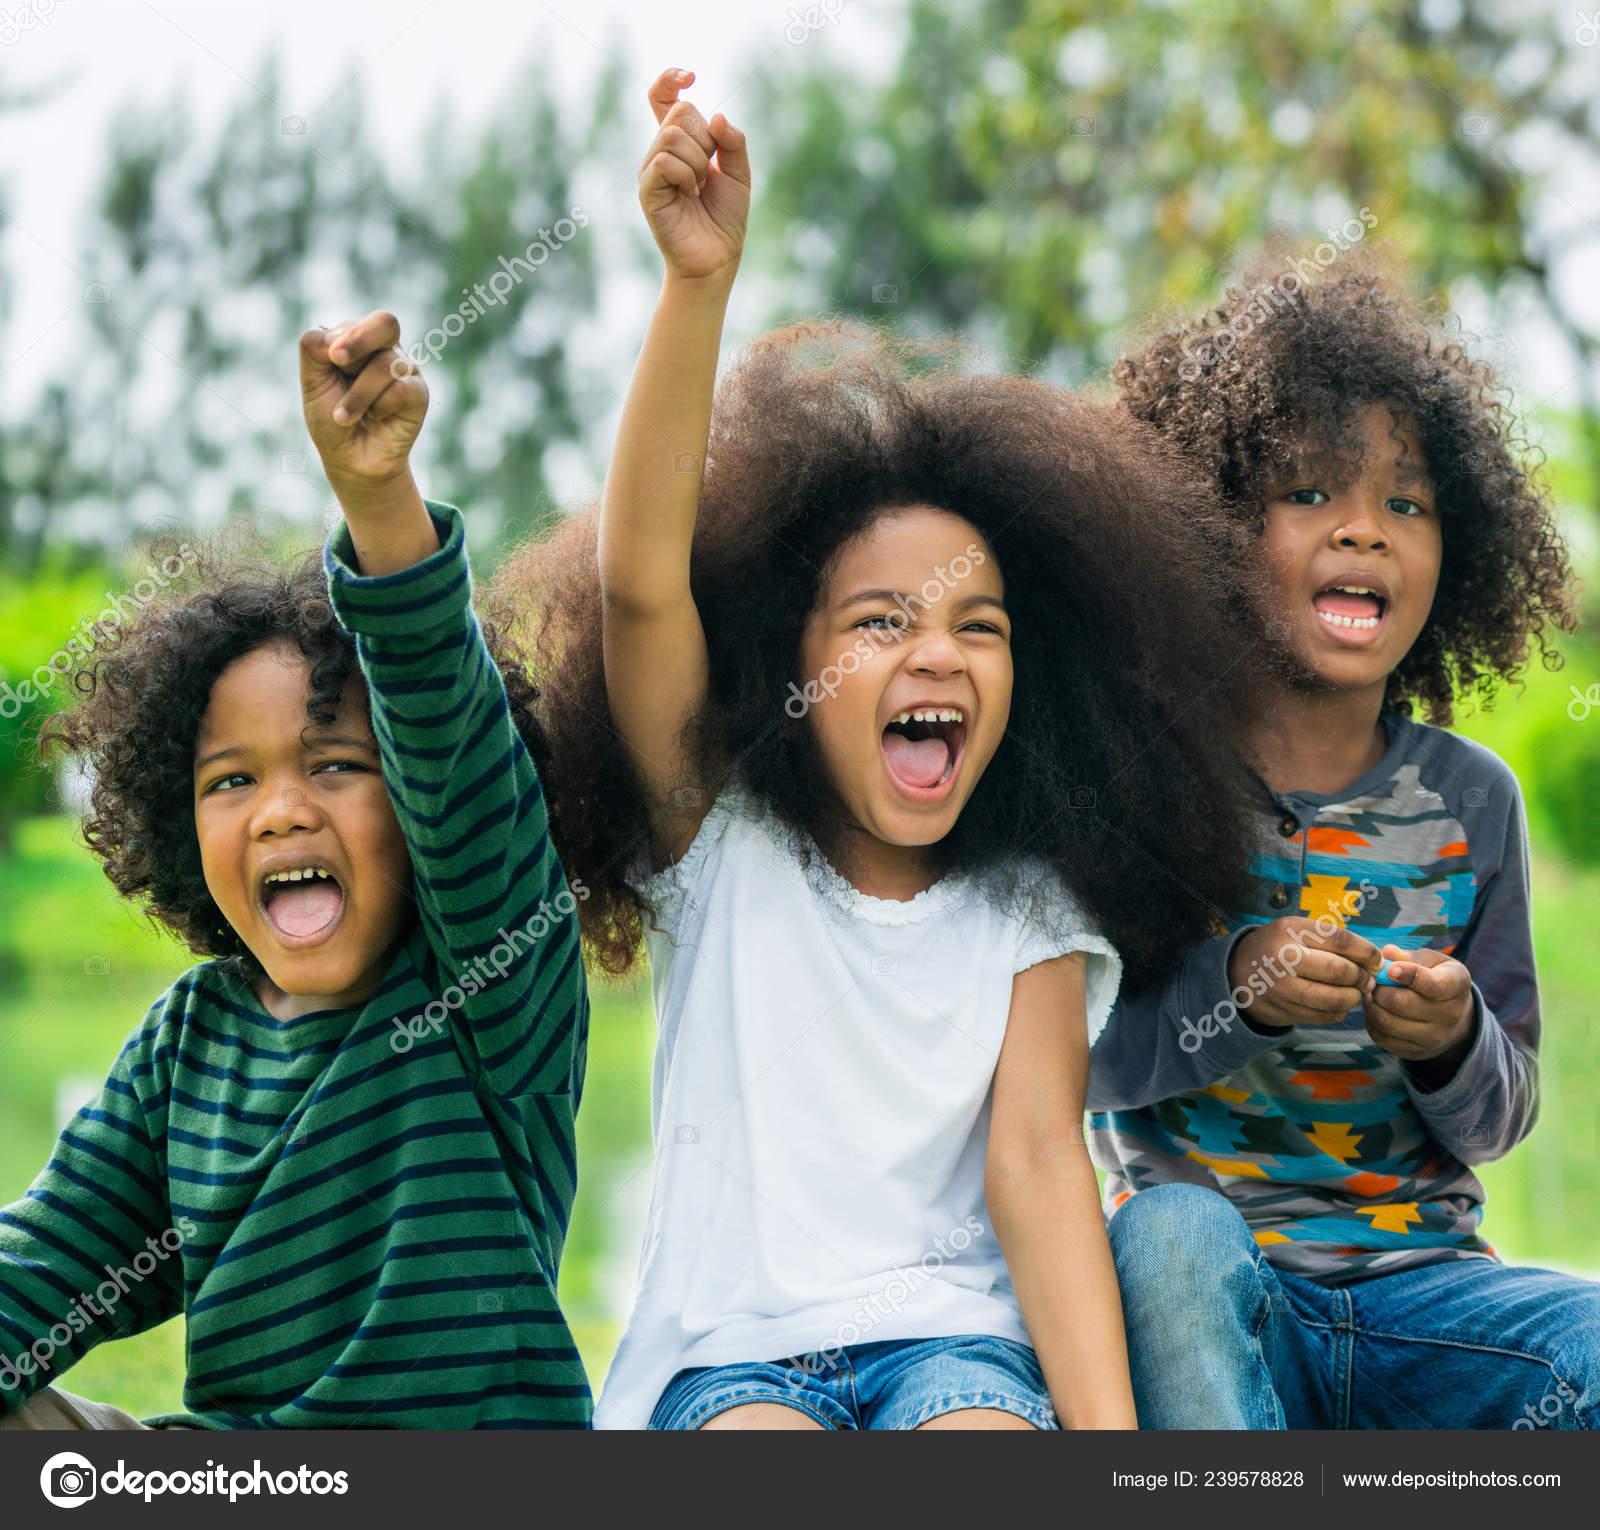 29829d70366 Ευτυχισμένη Αφρικανική Αμερικανική Αγόρι Και Κορίτσι Παιδιά Ομάδα ...